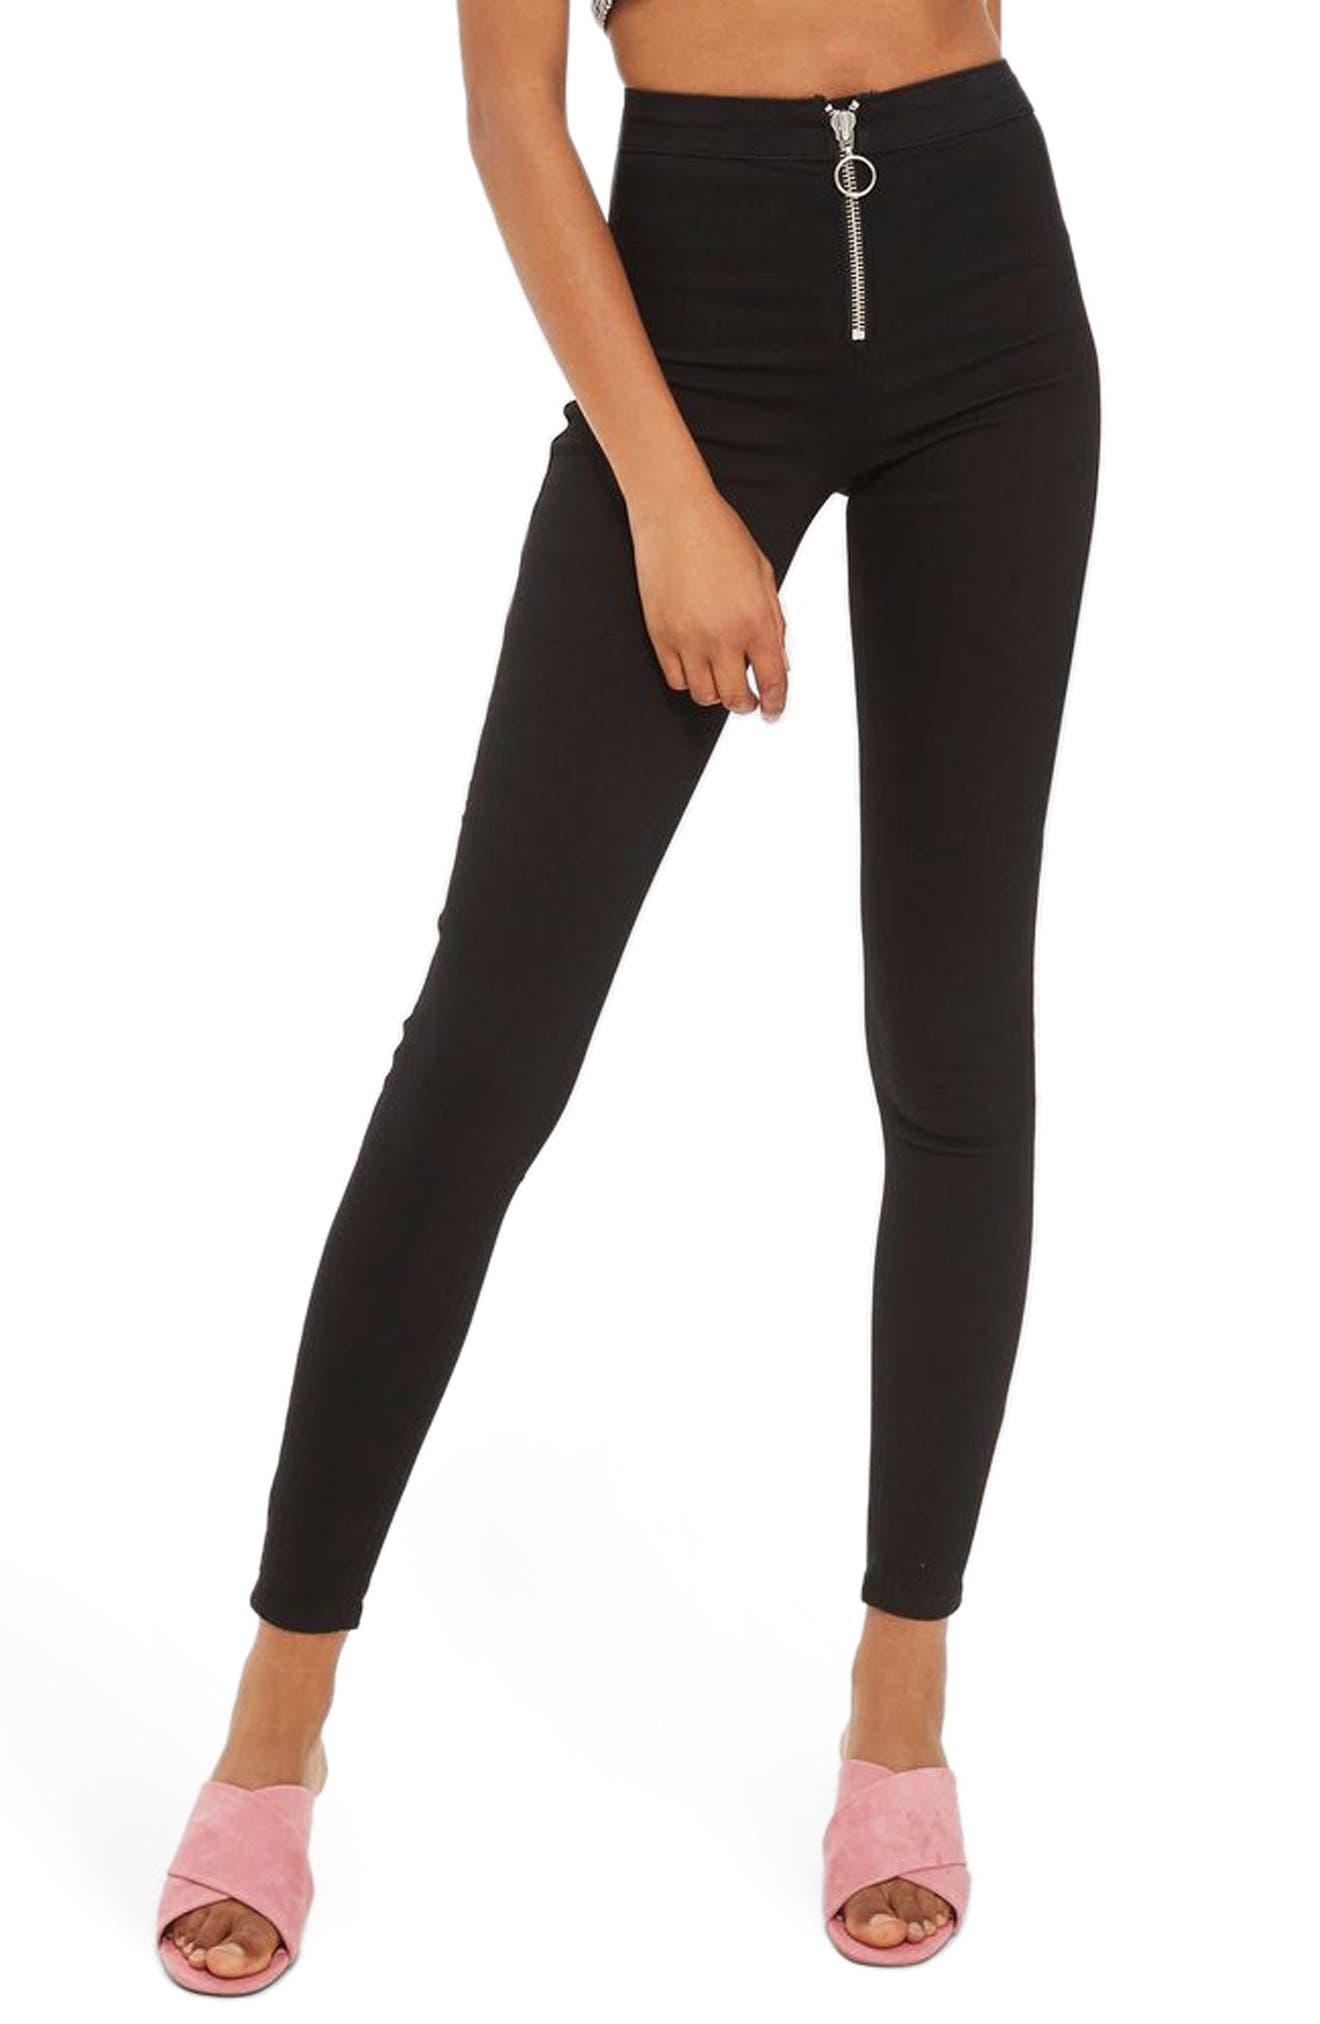 Alternate Image 1 Selected - Topshop Joni High Rise Zip Front Super Skinny Jeans